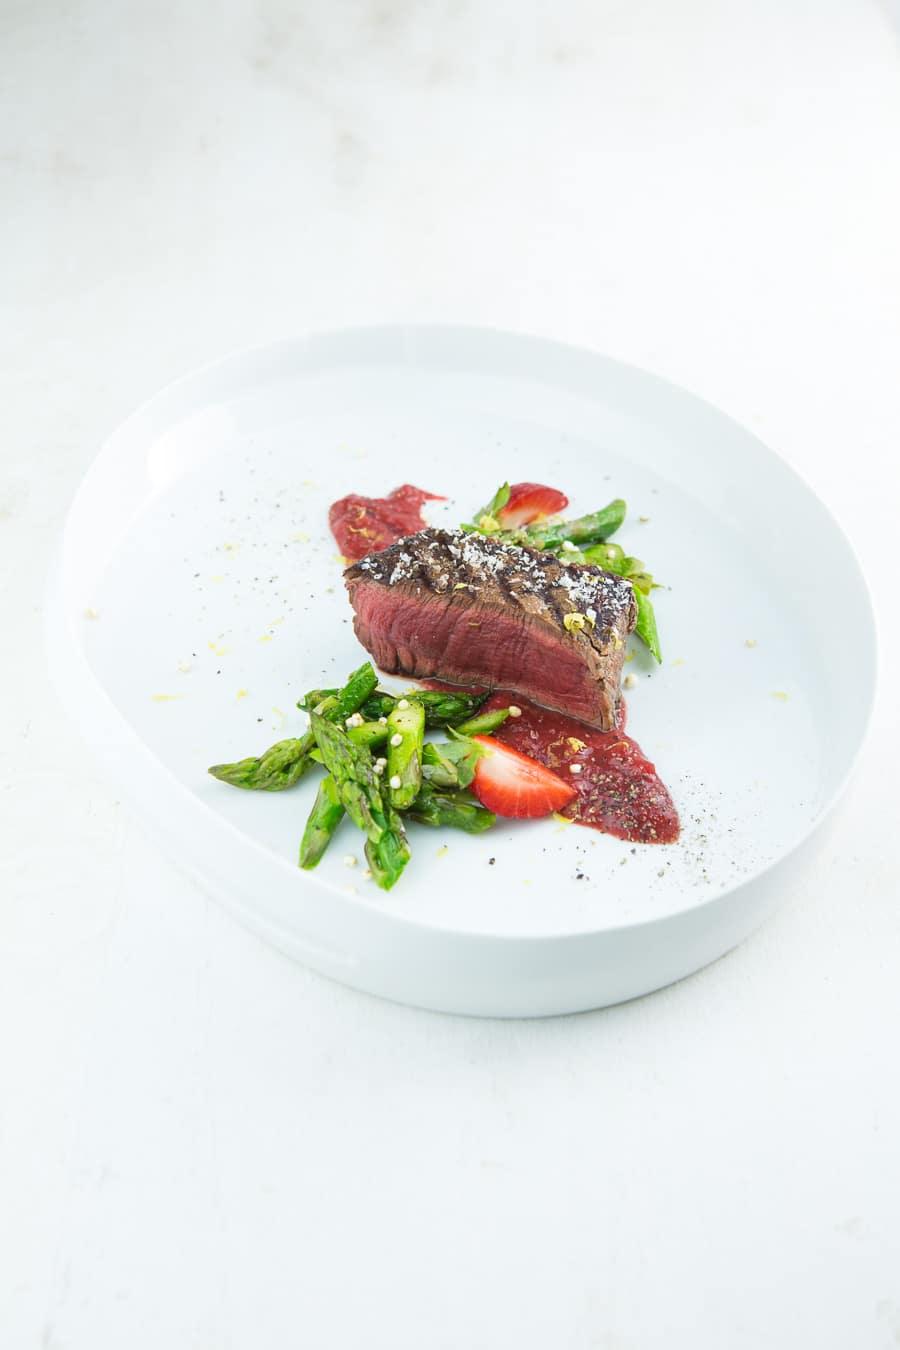 rinderfilet-vom-grill-erdbeersauce-gruener-spargel-1